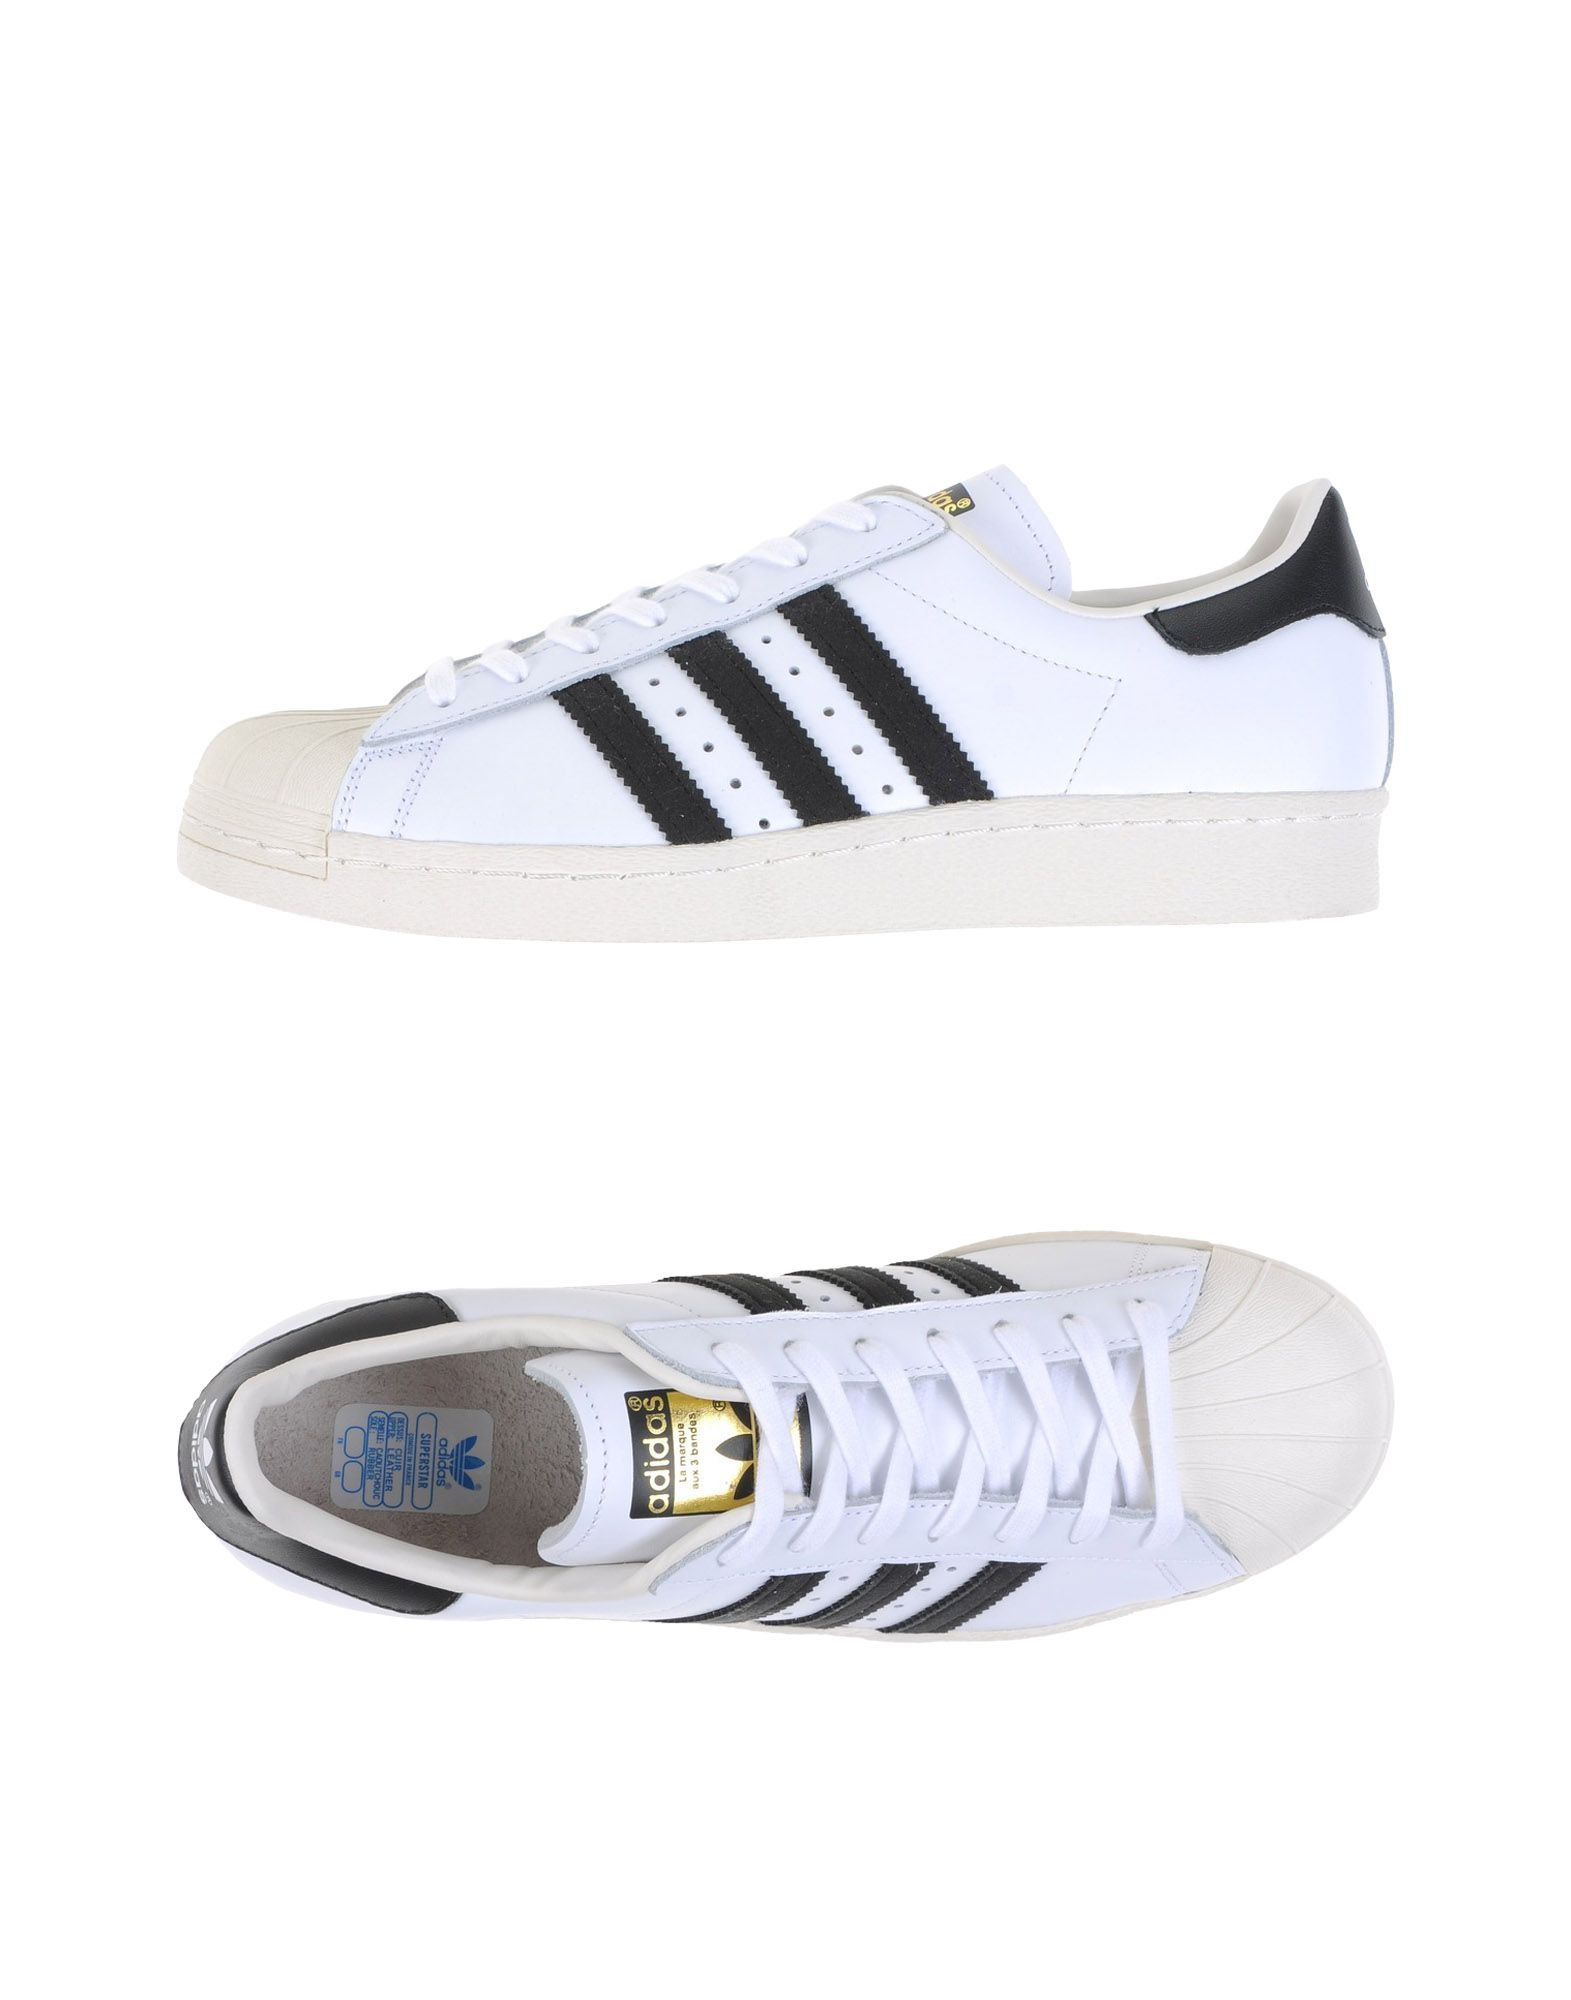 Adidas Originals Superstar 80S - Uomo - 11082081TN